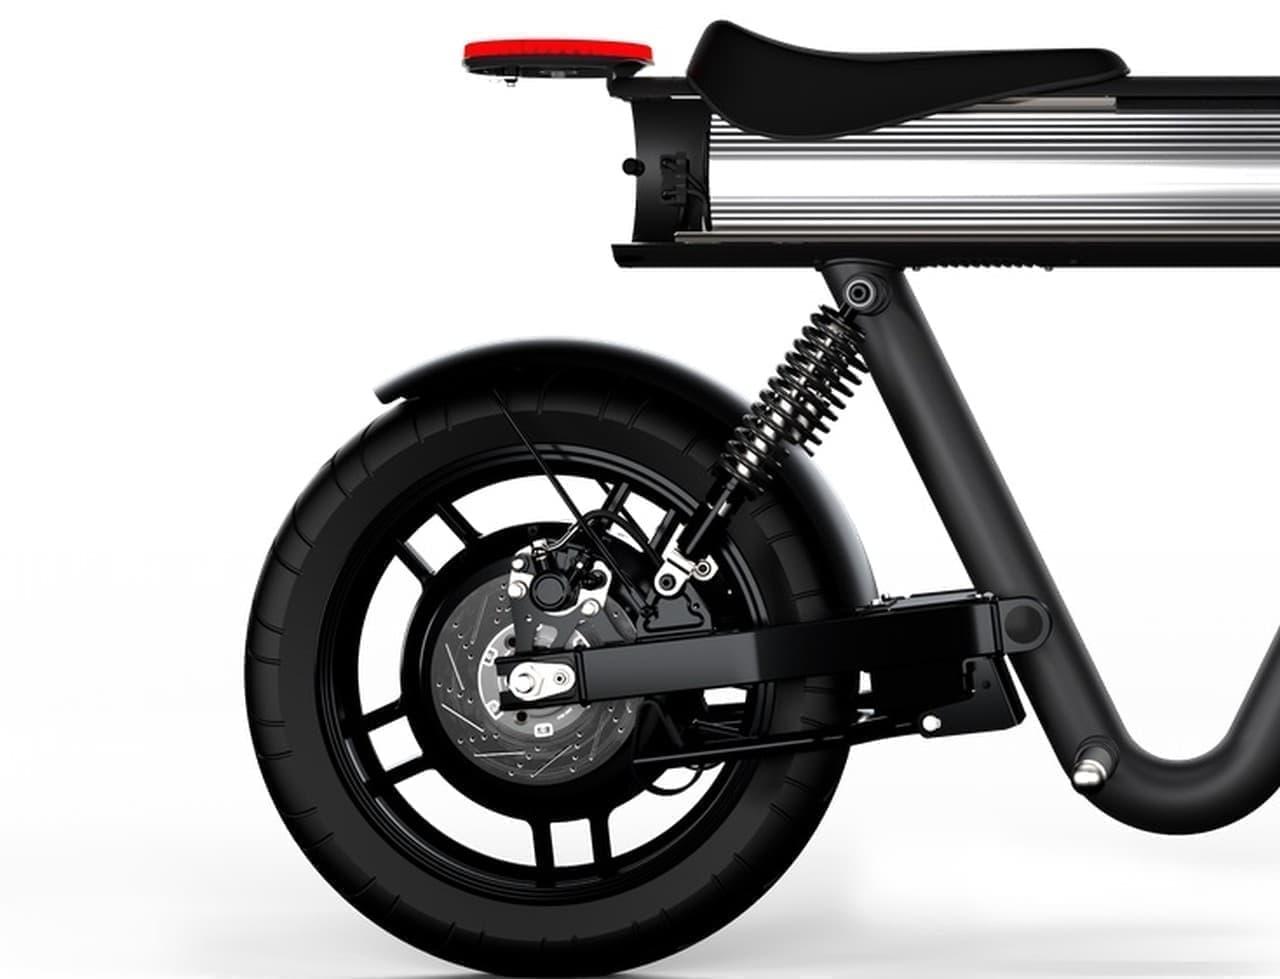 Sol Motorsが電動バイク「Pocket Rocket」のプリオーダーを開始